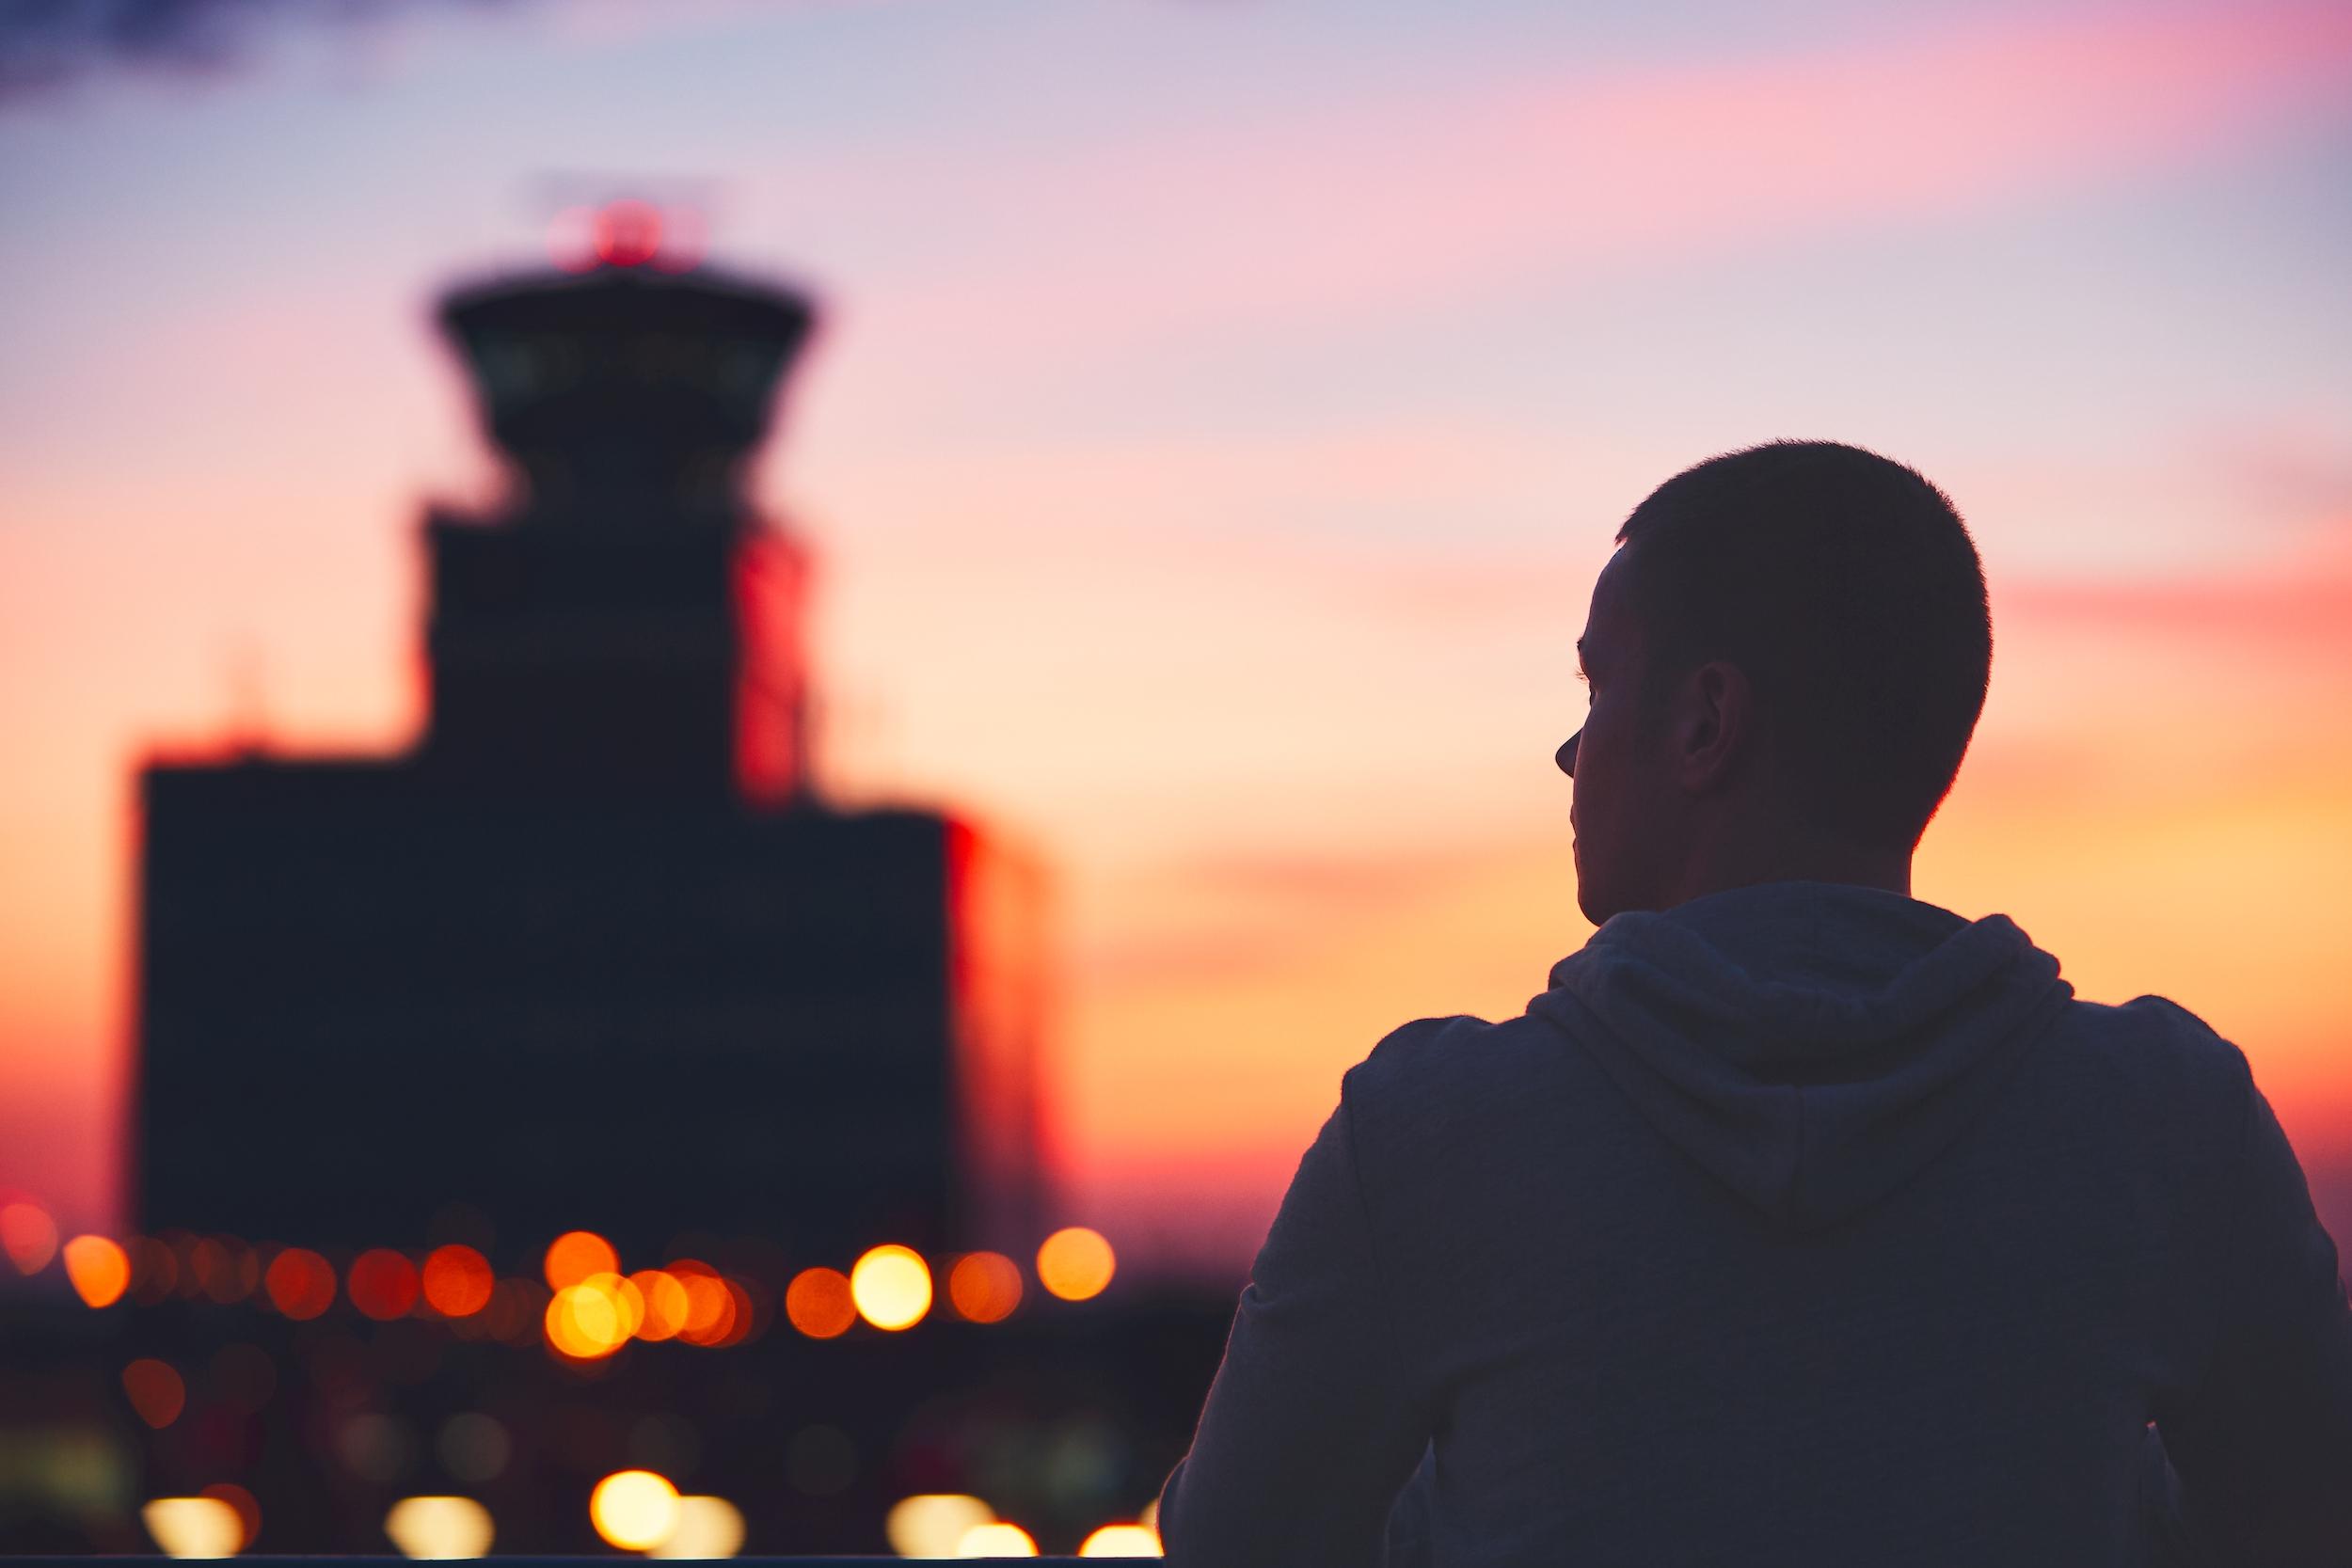 Man looking at air traffic control tower